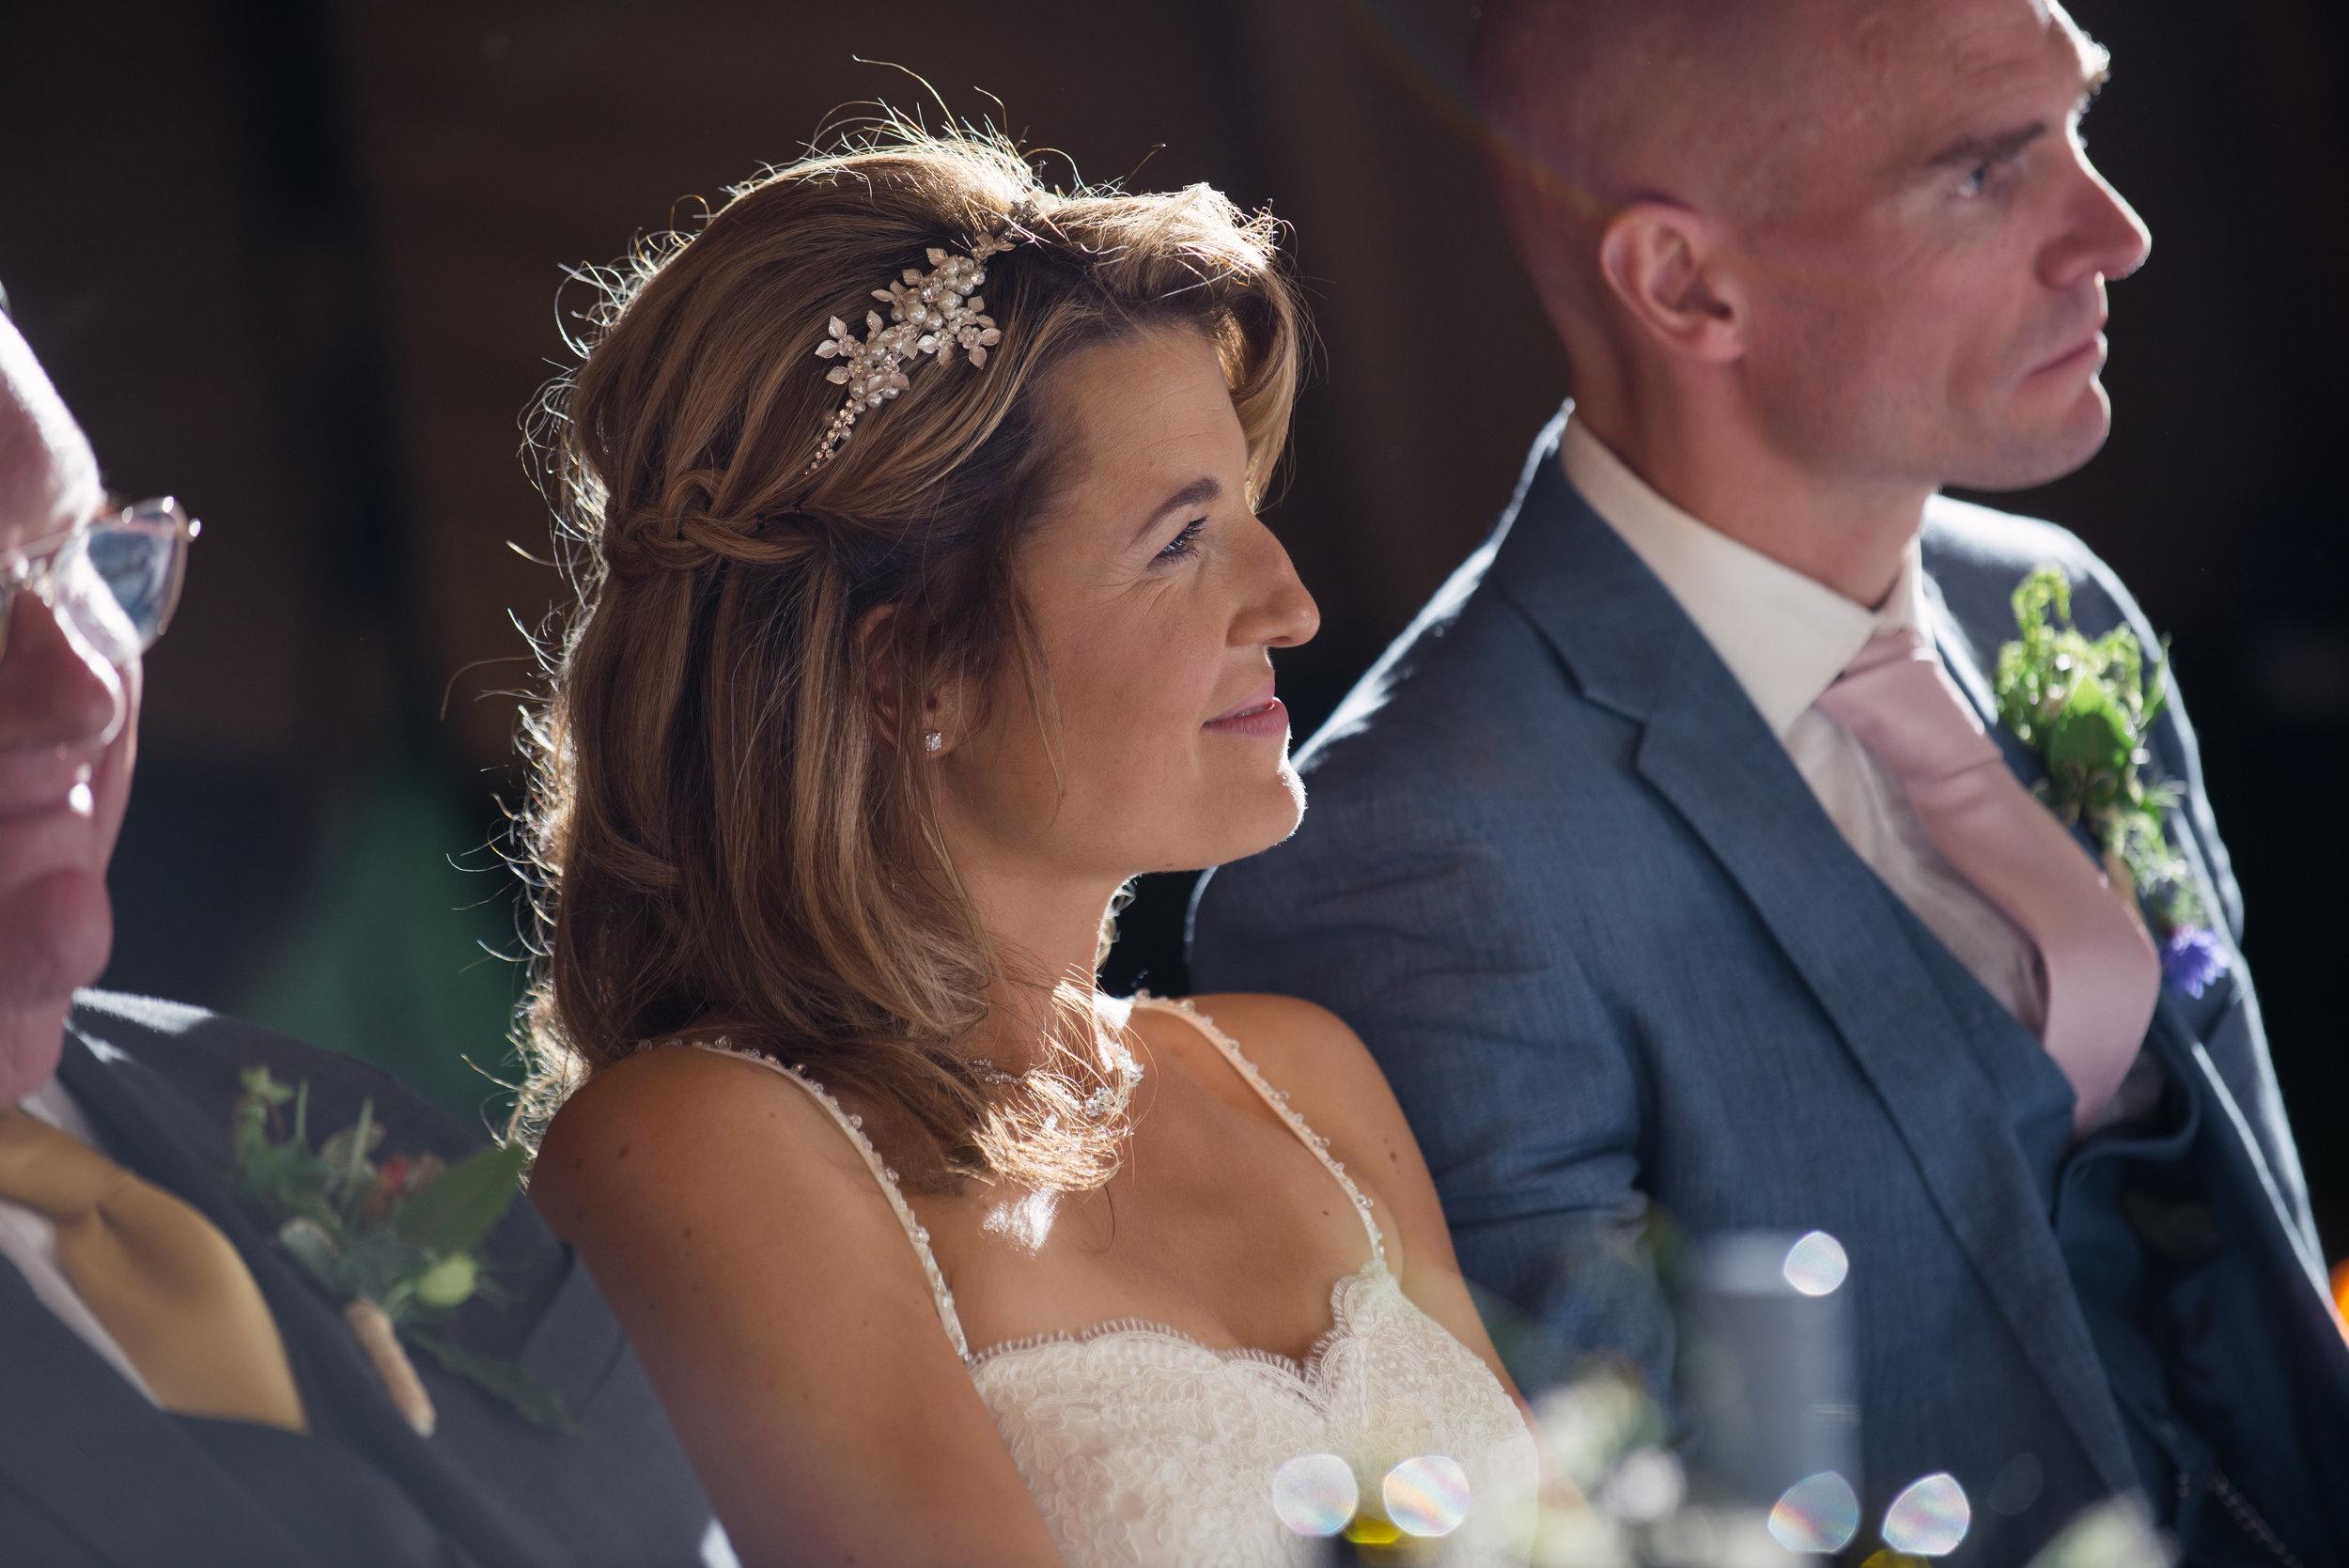 Wales Wedding Photography, Meridian Photography, Northern Michigan Wedding Photographers